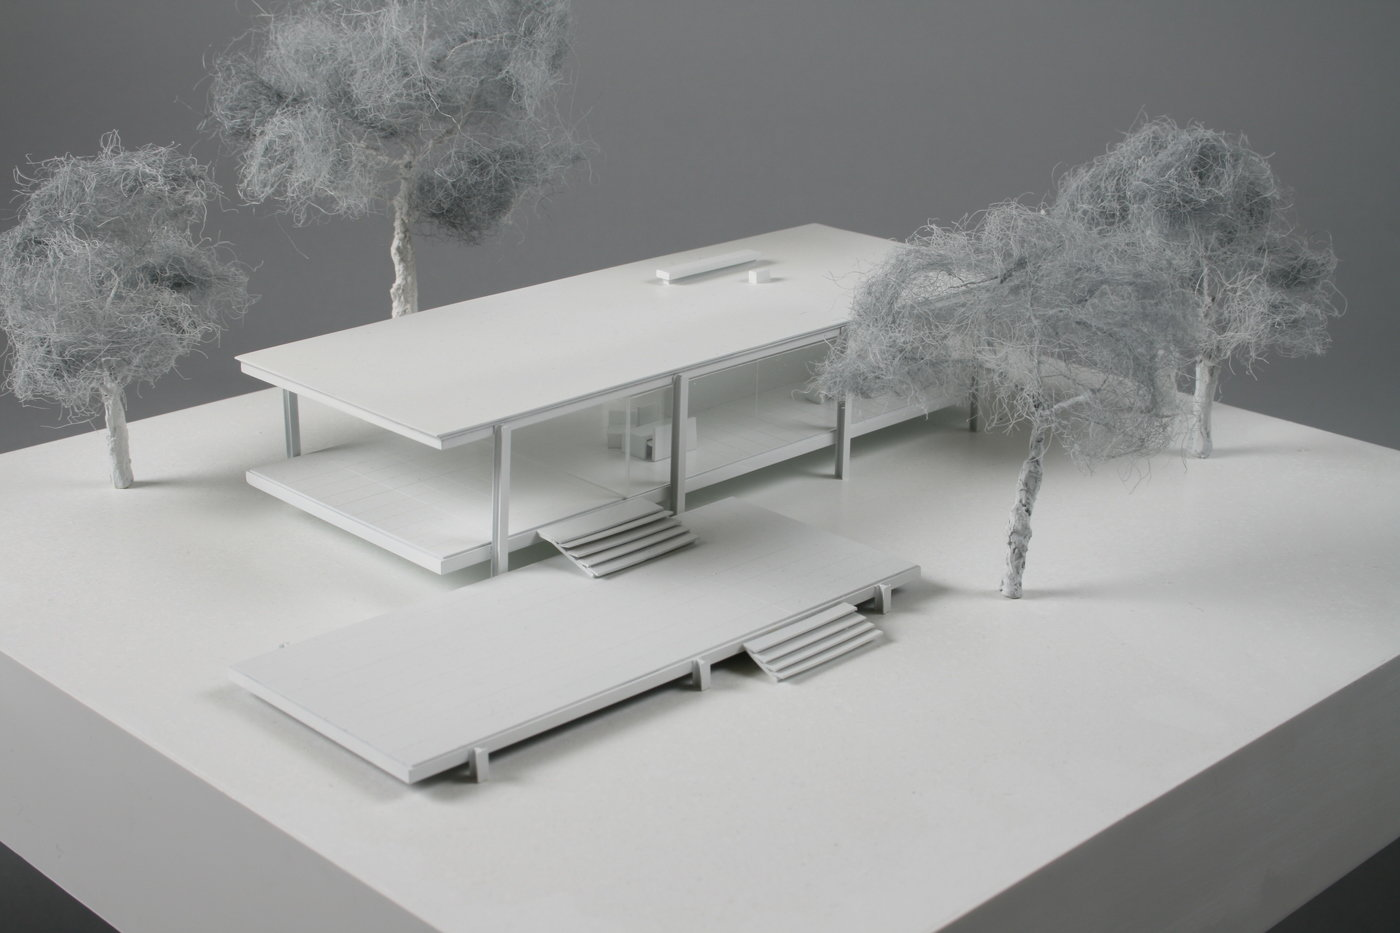 farnsworth house by steve hayward at coroflot com